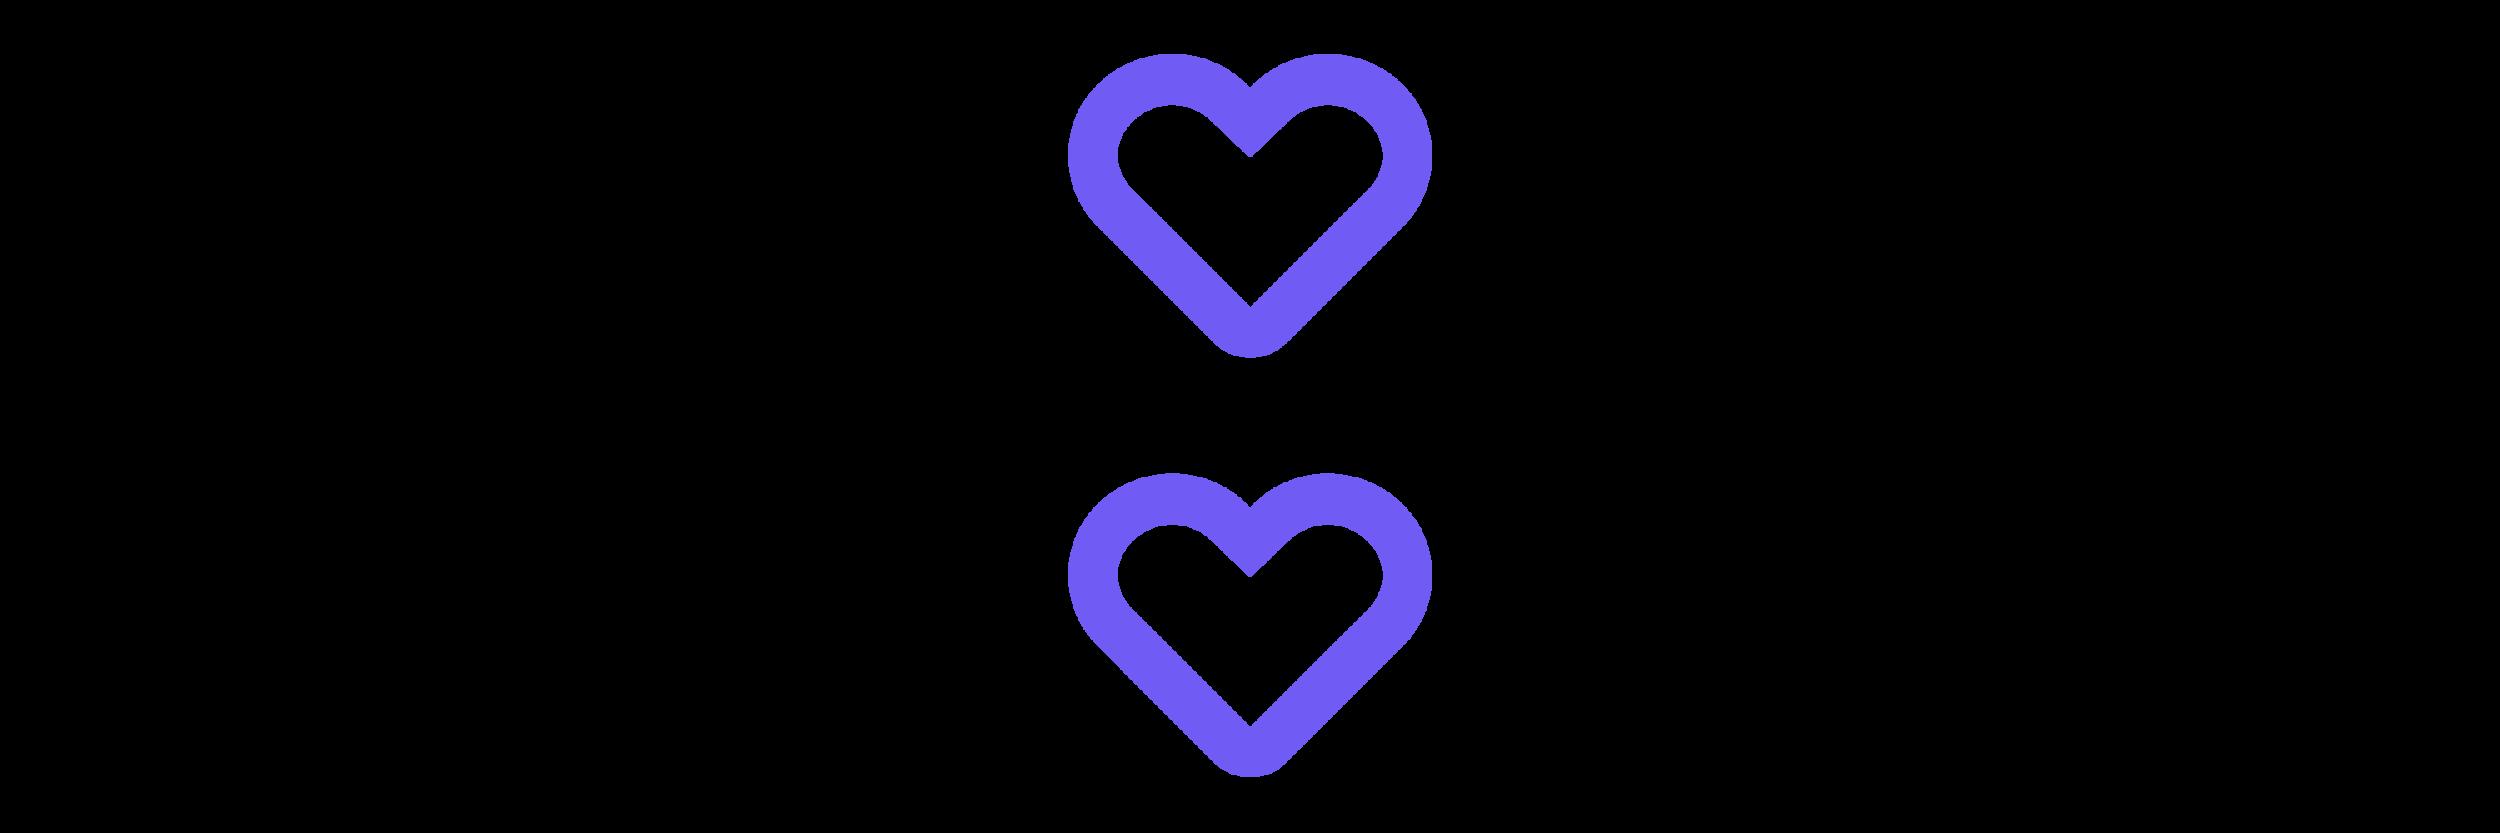 hearts-3000.png